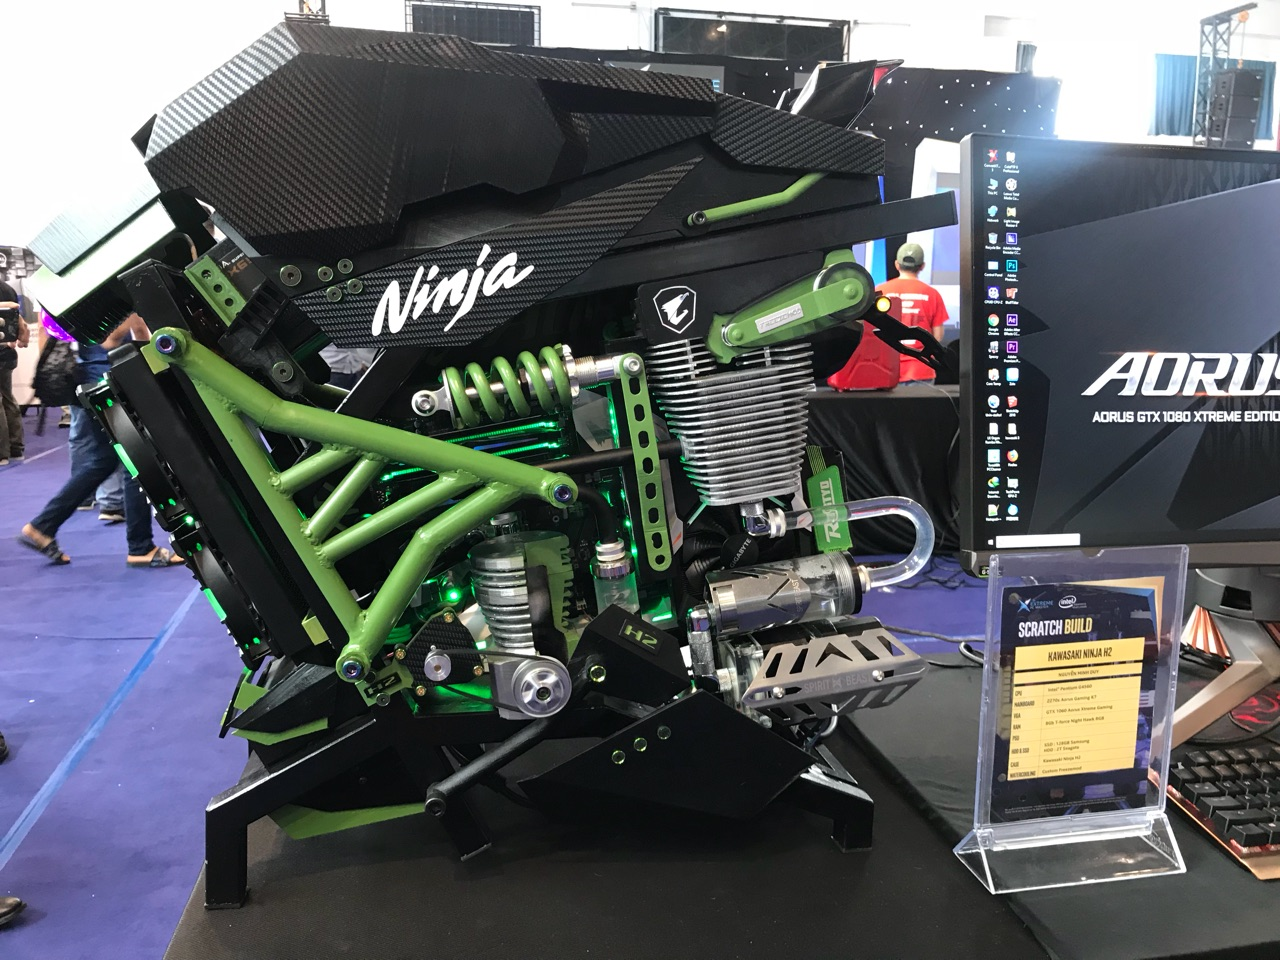 Kawasaki H2 - Giải ba hạng mục Scratch Build